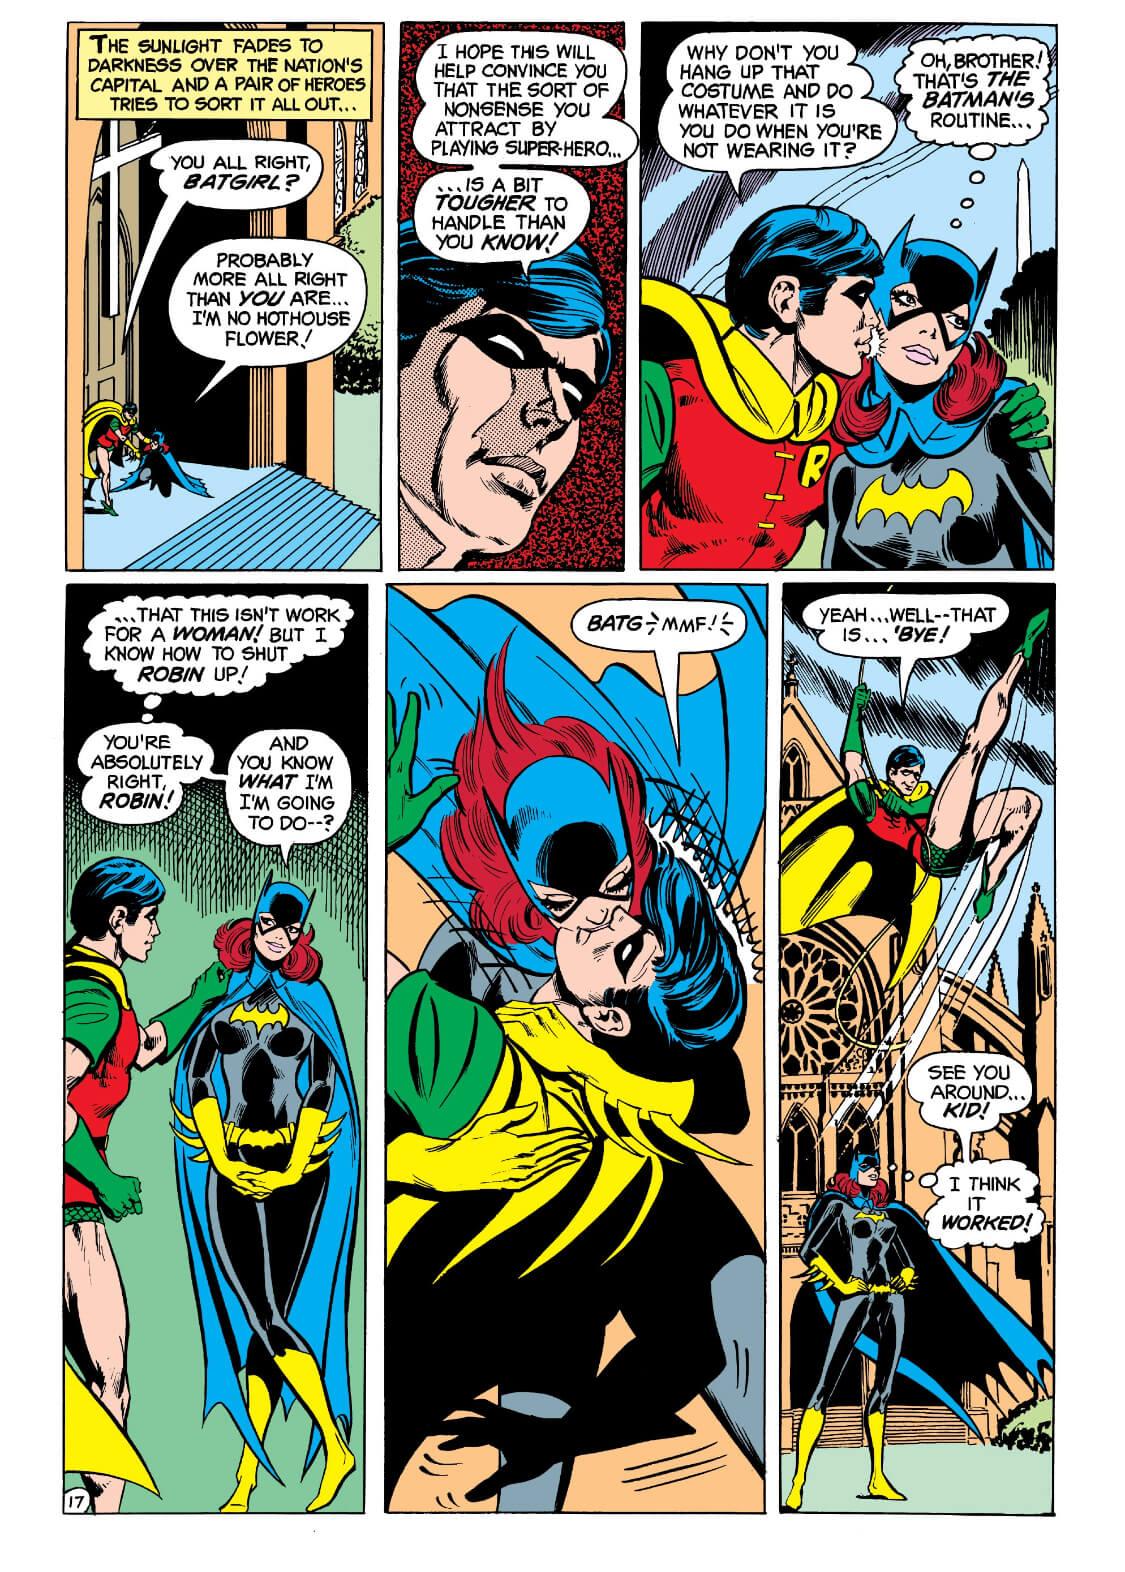 robin-batgirl.jpg